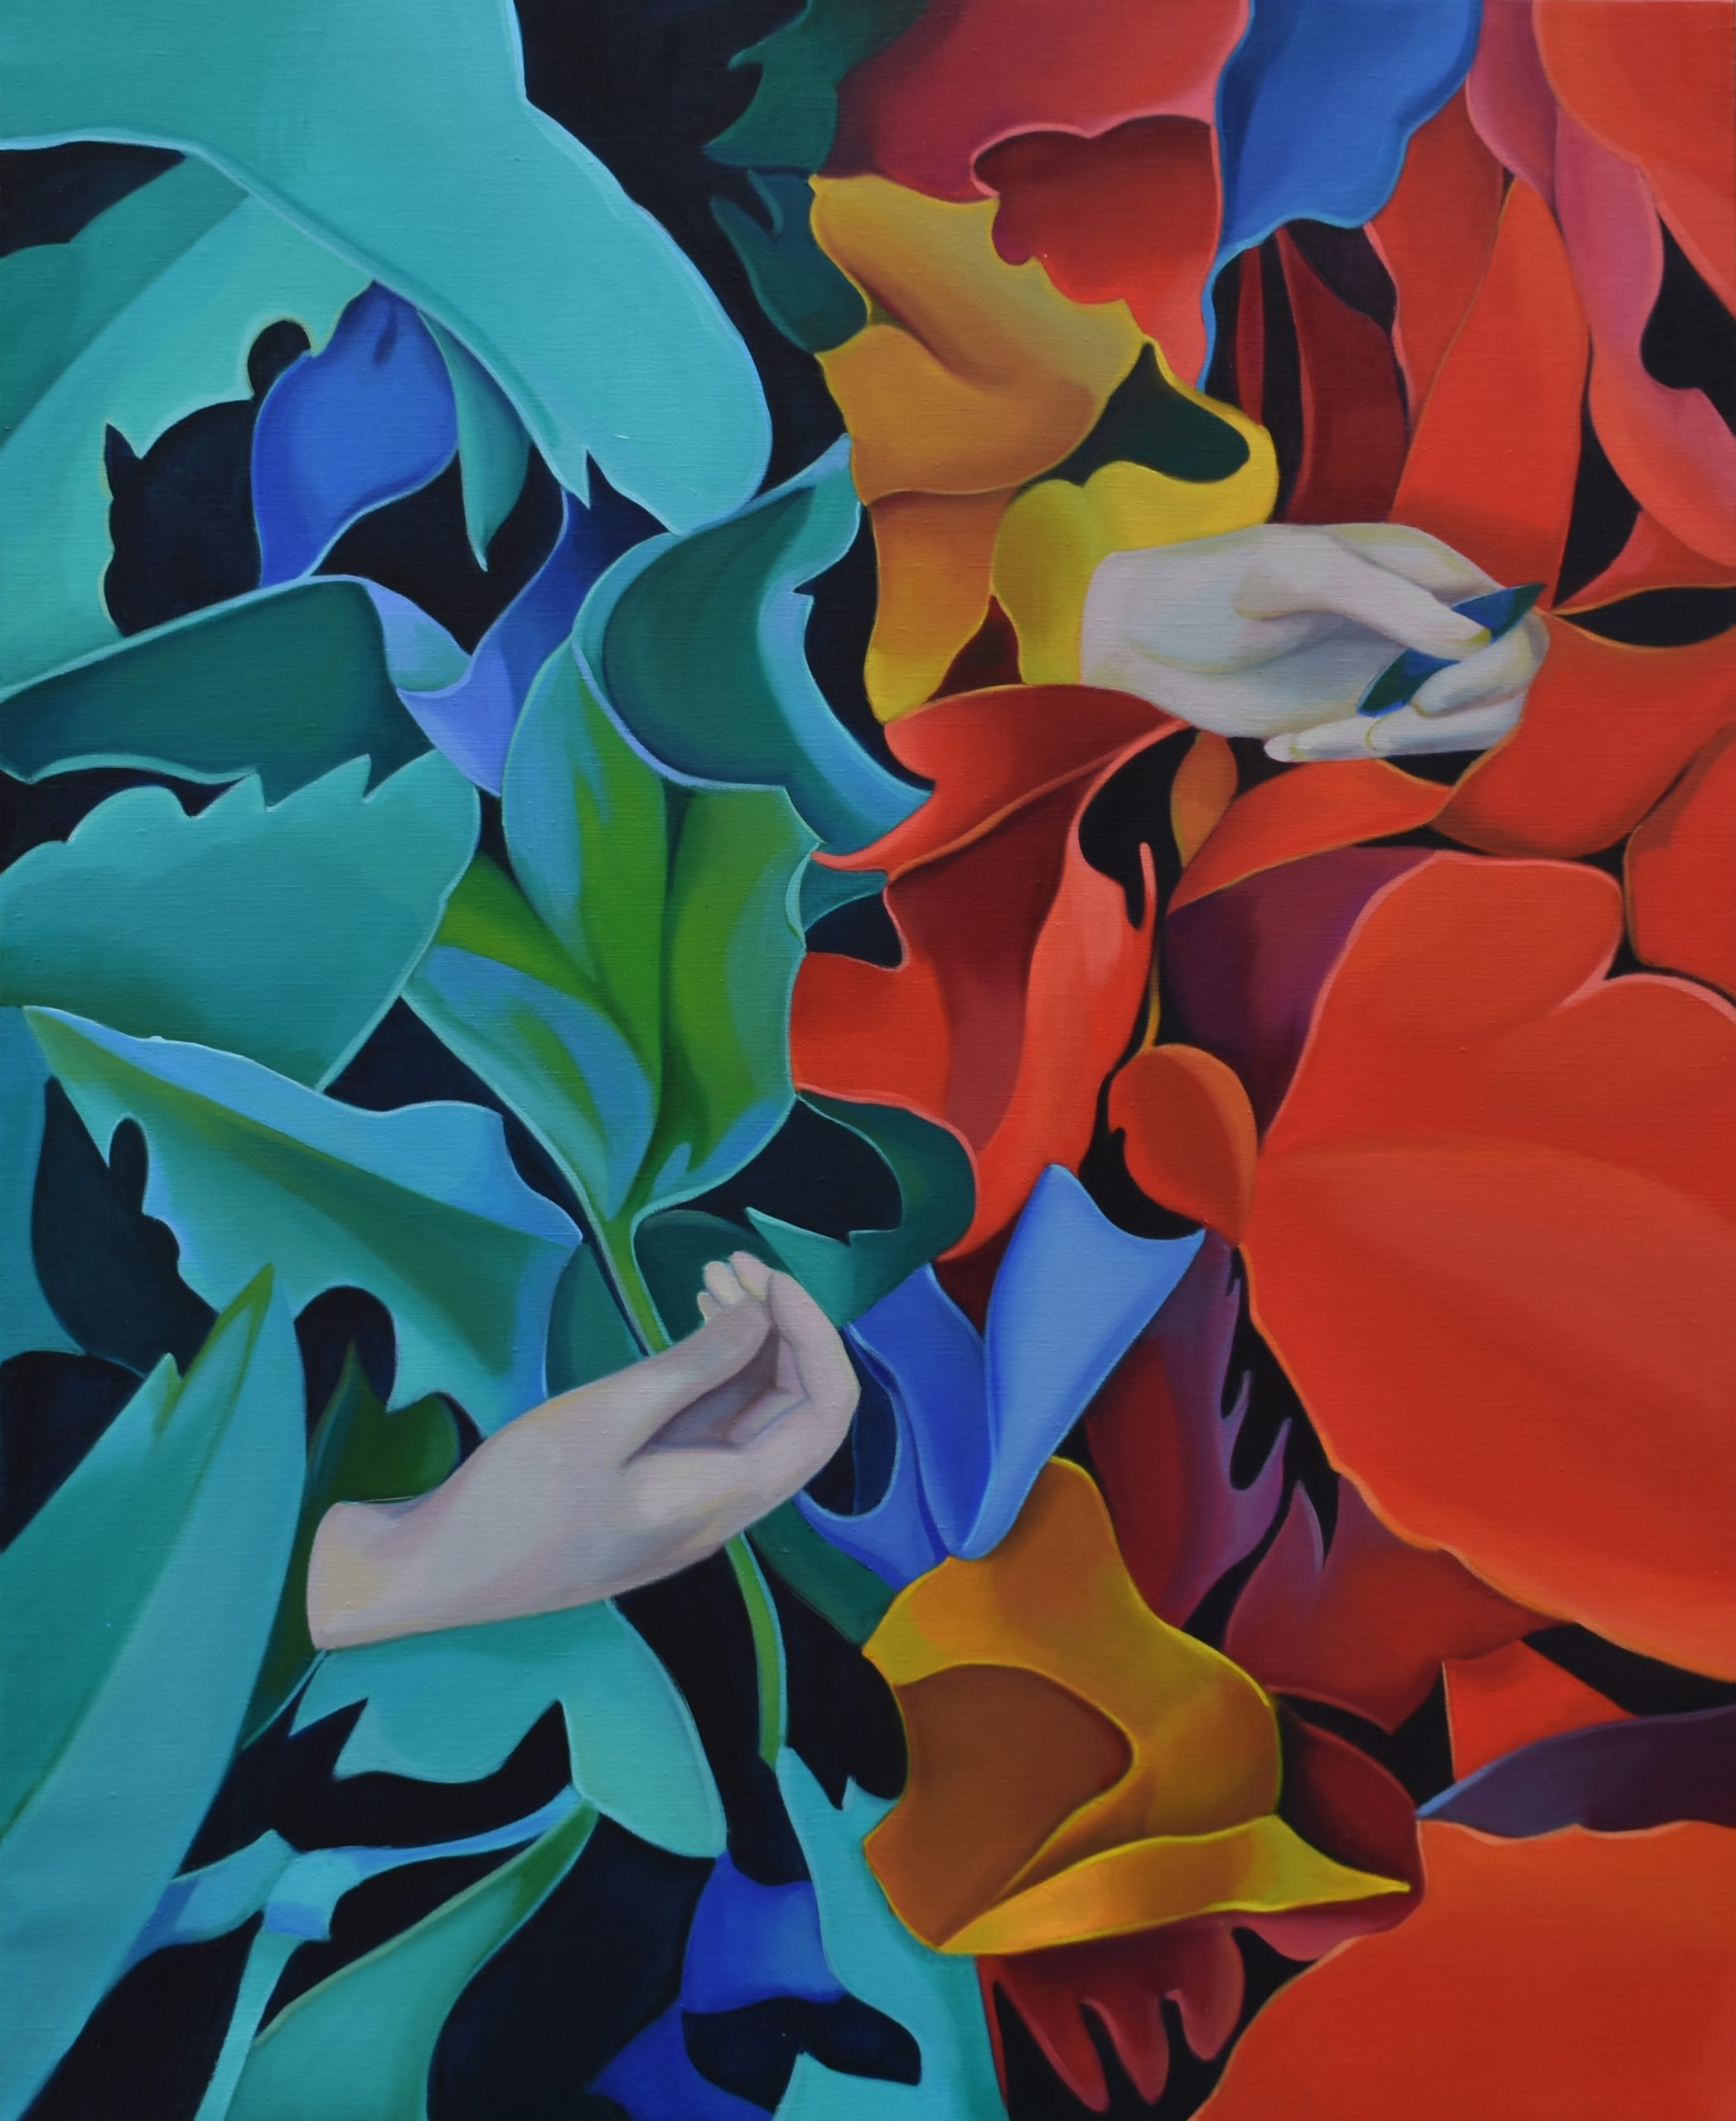 Lorena García Mateu, The opportunity, 2020 (Oil on linen, 130 x 97 cm/ 51 1/8 x 38 1/4 in) FAD magazine